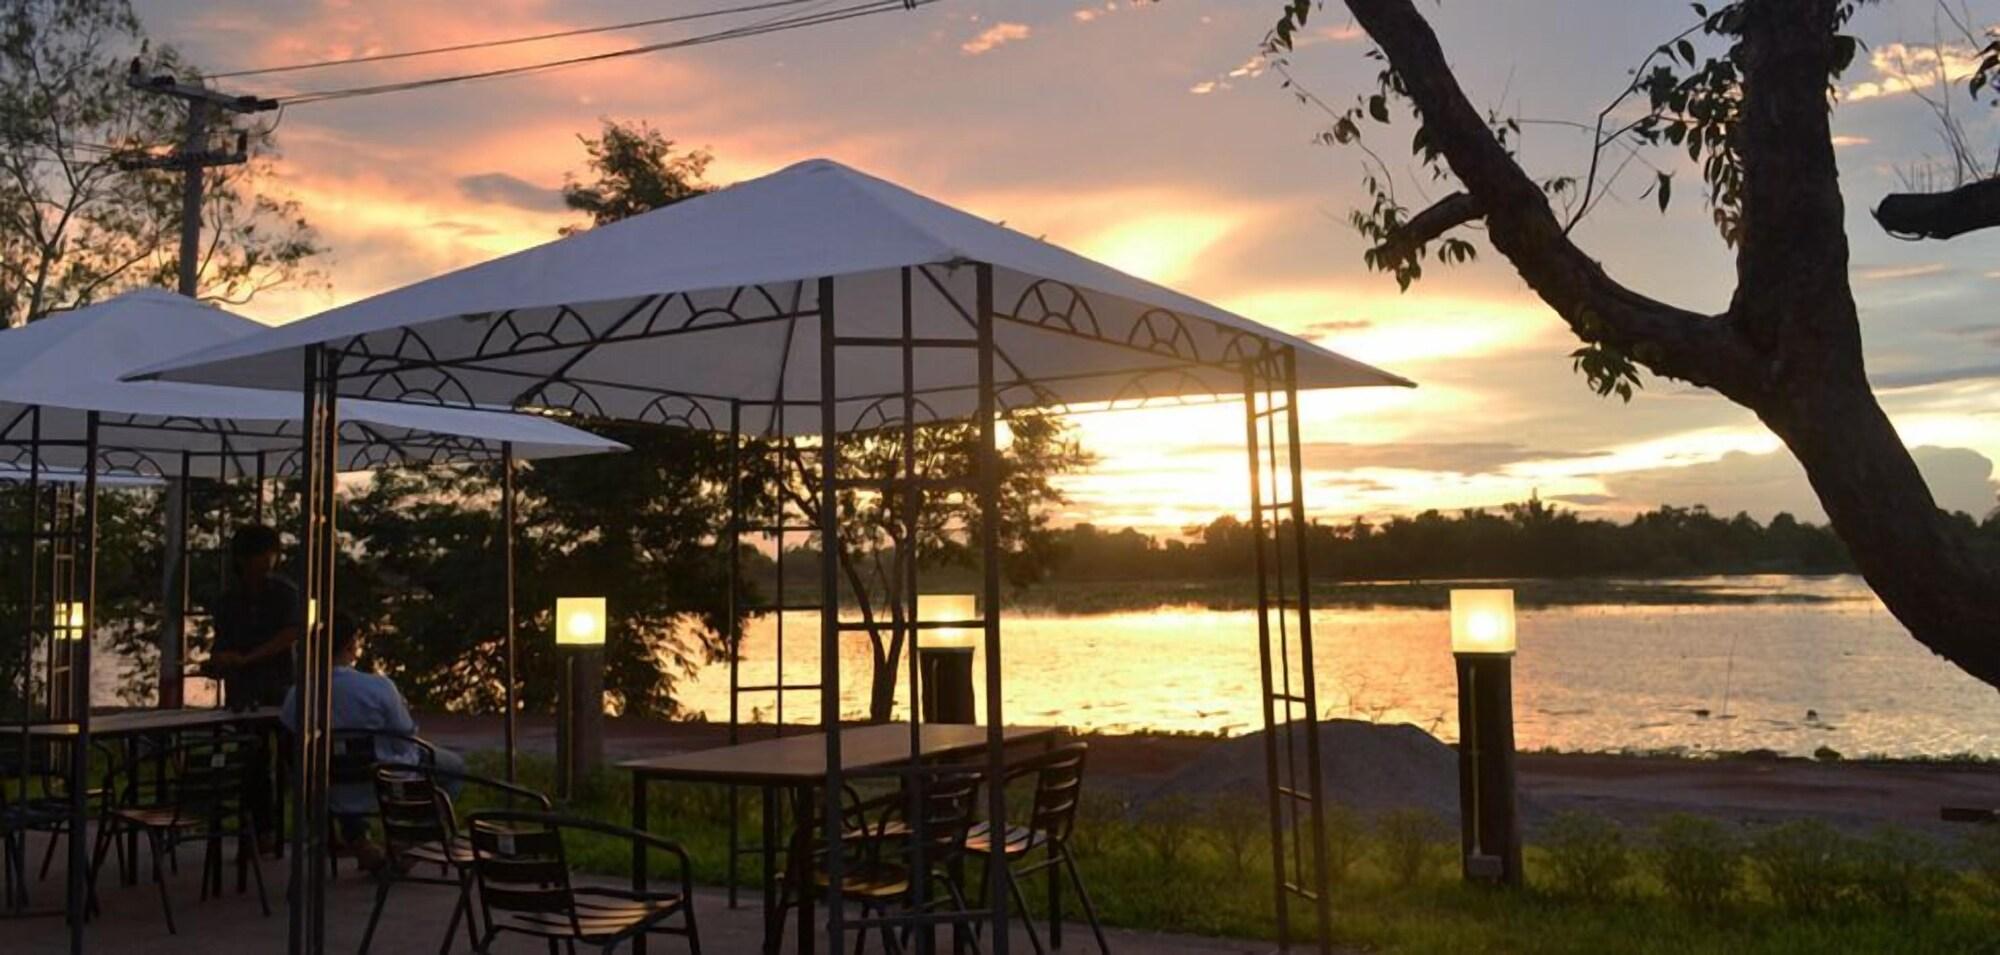 Bualinn Resort Nongkhai, Muang Nong Khai